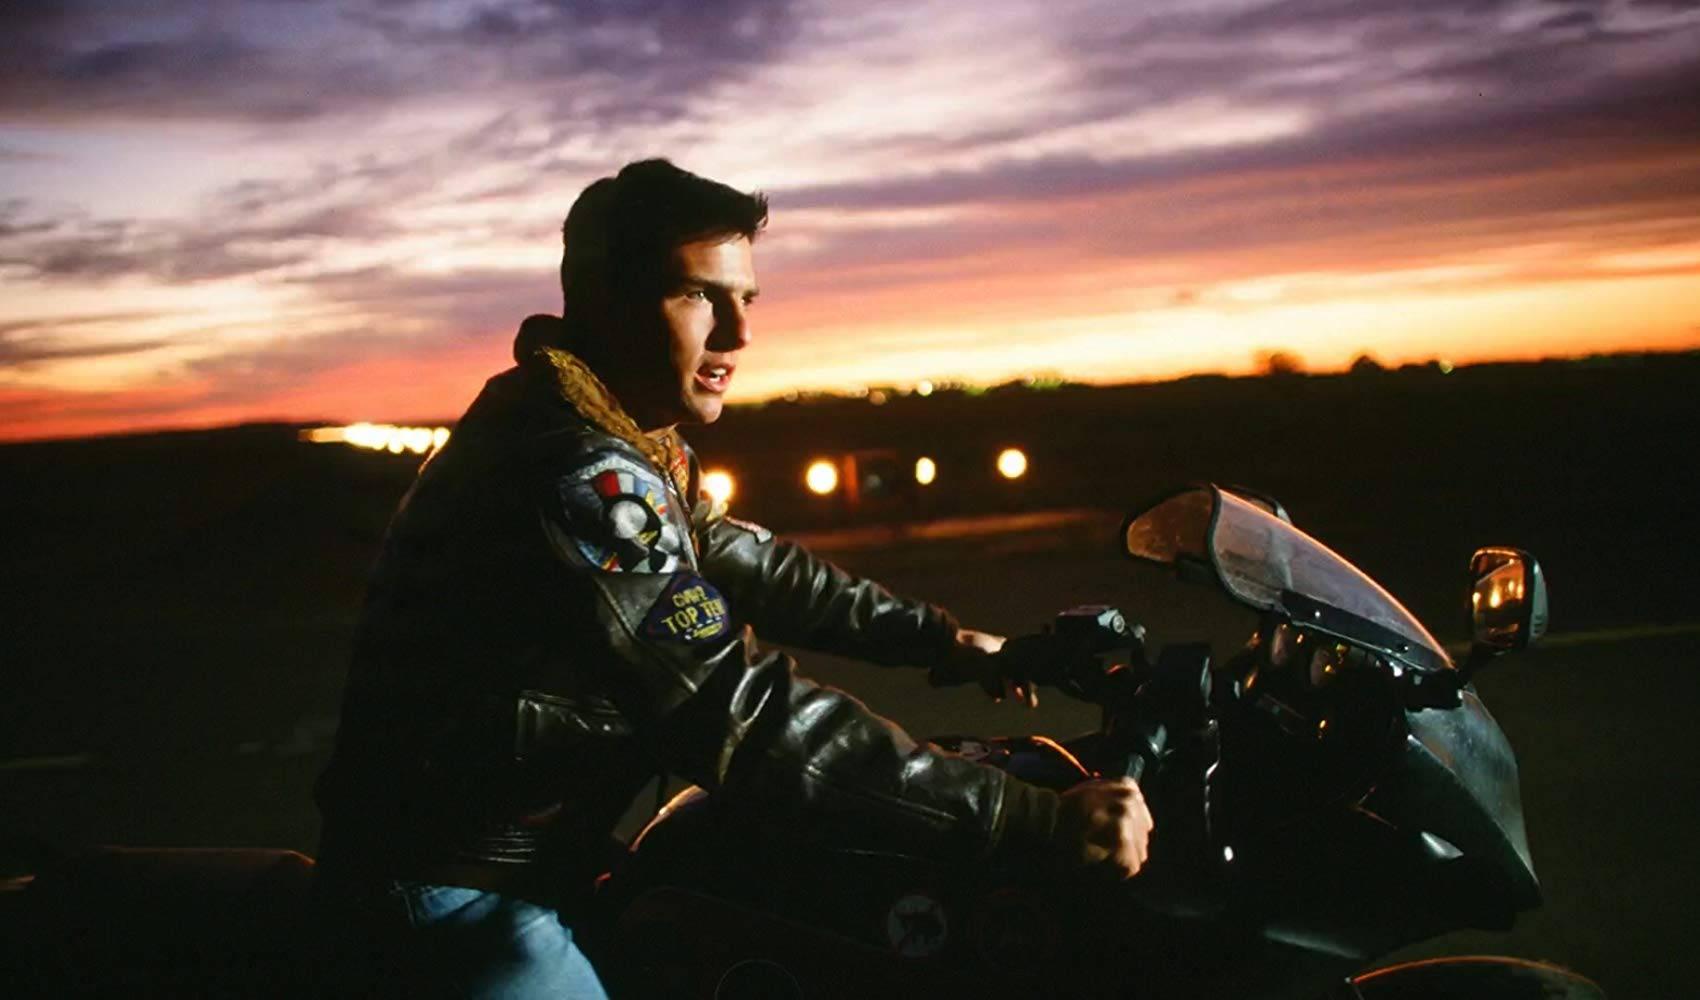 Stigao prvi video sa snimanja drugog dijela filma 'Top Gun'